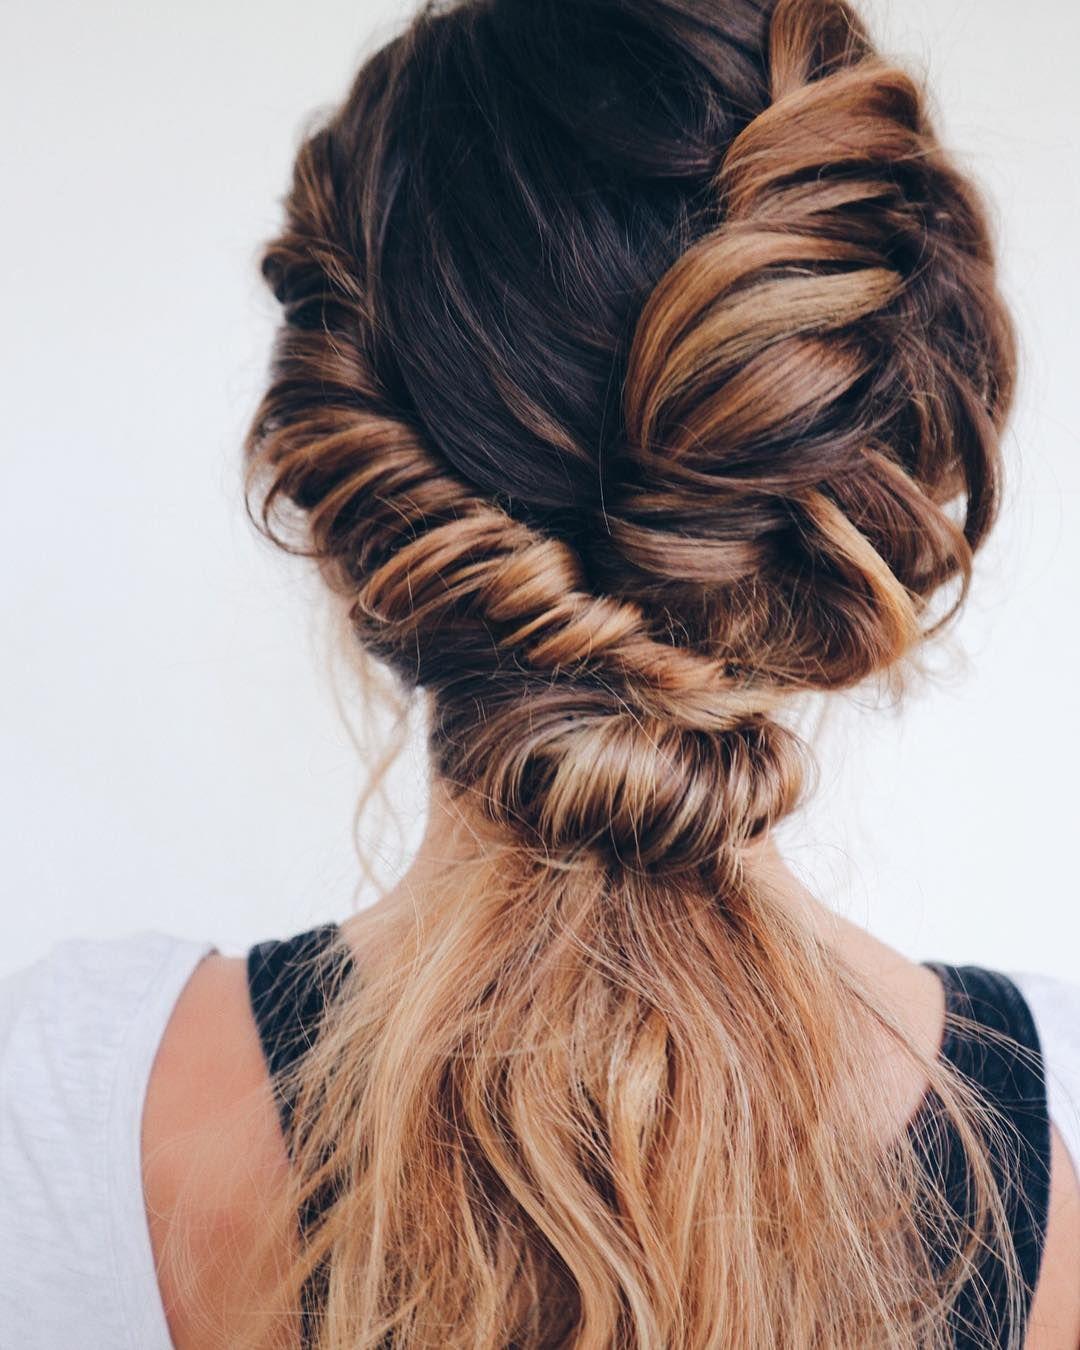 "31 Gorgeous braid hairstyle – weekend hair dos,braids , pull through <a class=""pintag"" href=""/explore/hair/"" title=""#hair explore Pinterest"">#hair</a> <a class=""pintag"" href=""/explore/hairstyle/"" title=""#hairstyle explore Pinterest"">#hairstyle</a> <a class=""pintag"" href=""/explore/hairstyles/"" title=""#hairstyles explore Pinterest"">#hairstyles</a><p><a href=""http://www.homeinteriordesign.org/2018/02/short-guide-to-interior-decoration.html"">Short guide to interior decoration</a></p>"